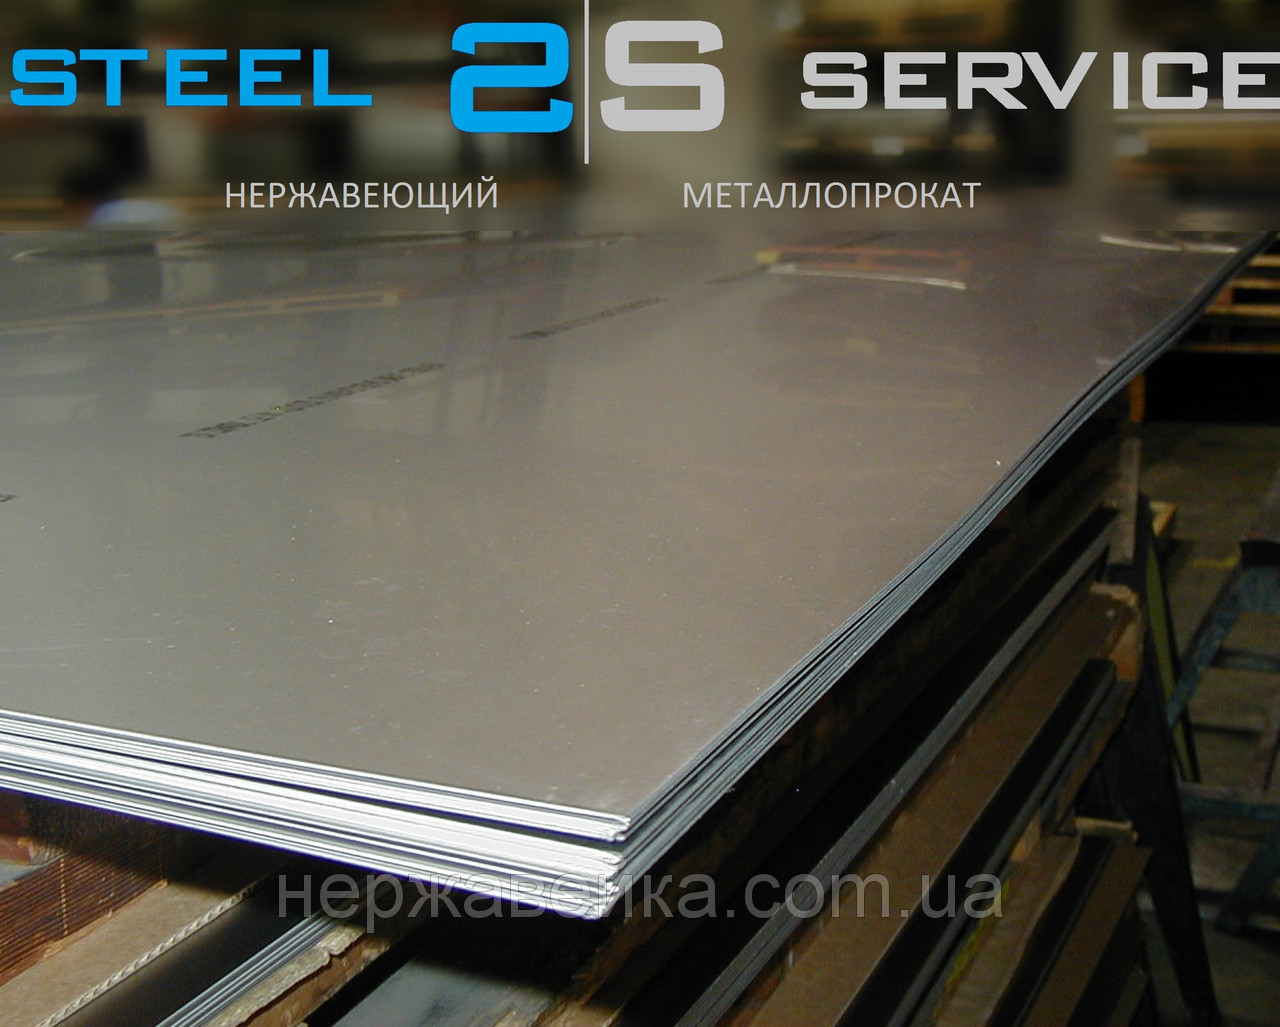 Нержавеющий лист 2х1500х3000мм  AISI 316Ti(10Х17Н13М2Т) BA - зеркало,  кислотостойкий